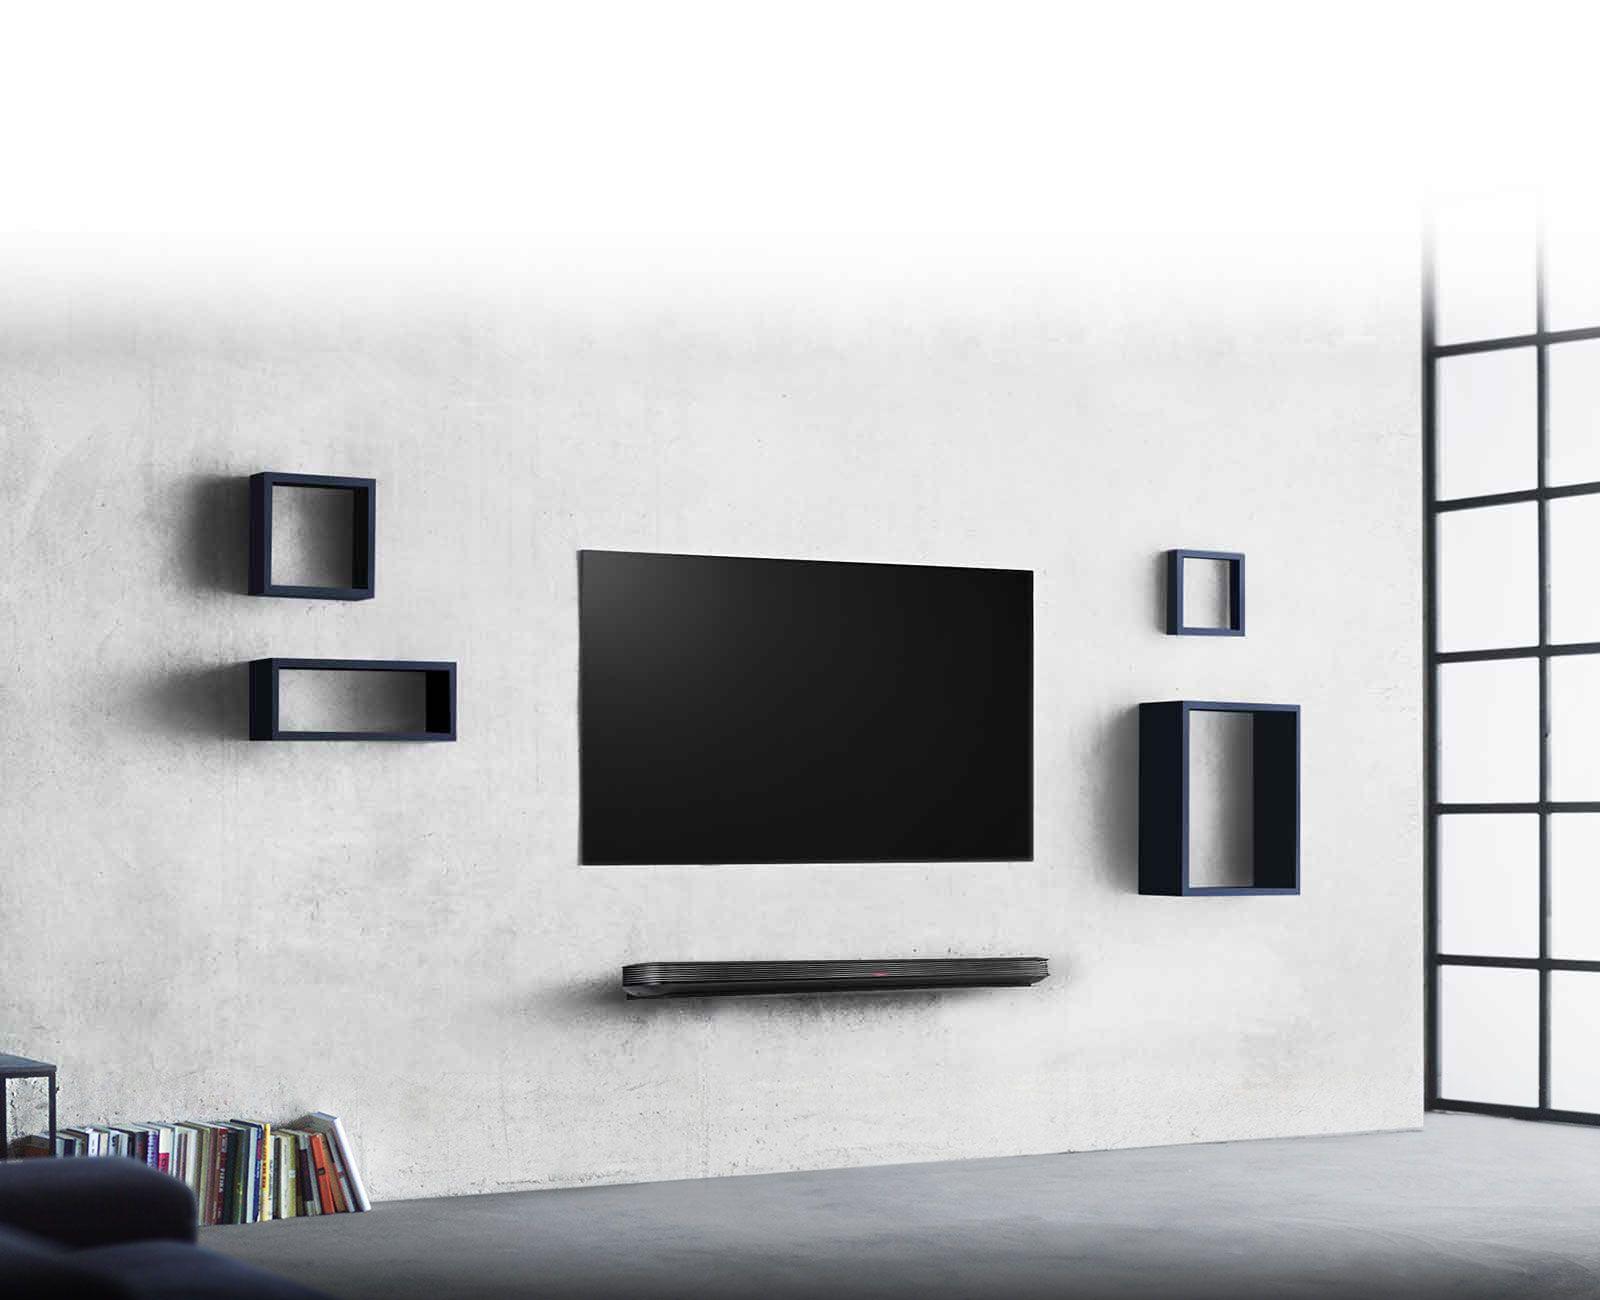 LG SIGNATURE OLED TV W 4K HDR Smart TV (7,999.99).